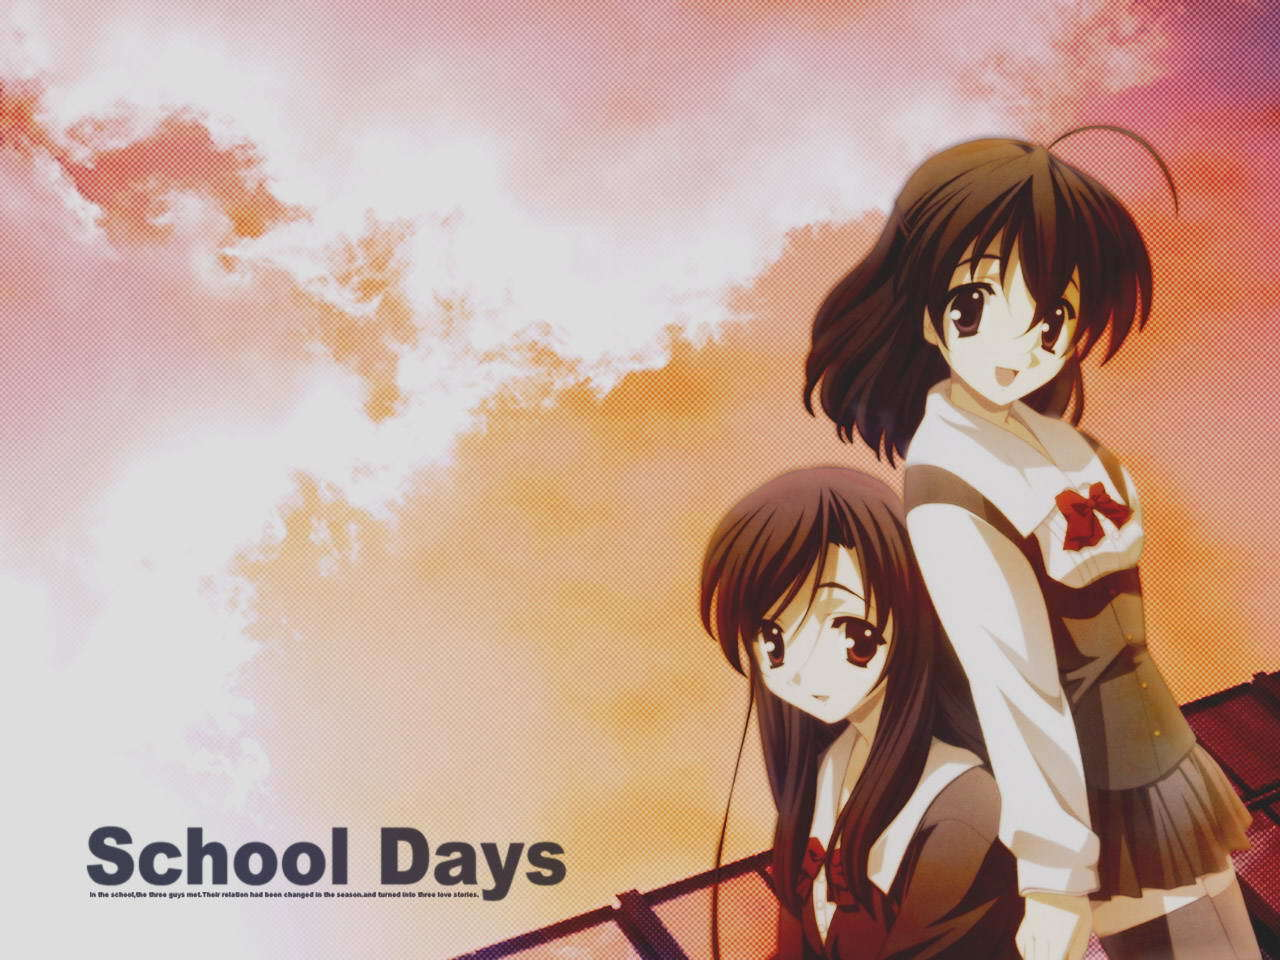 School Days - HD Wallpaper